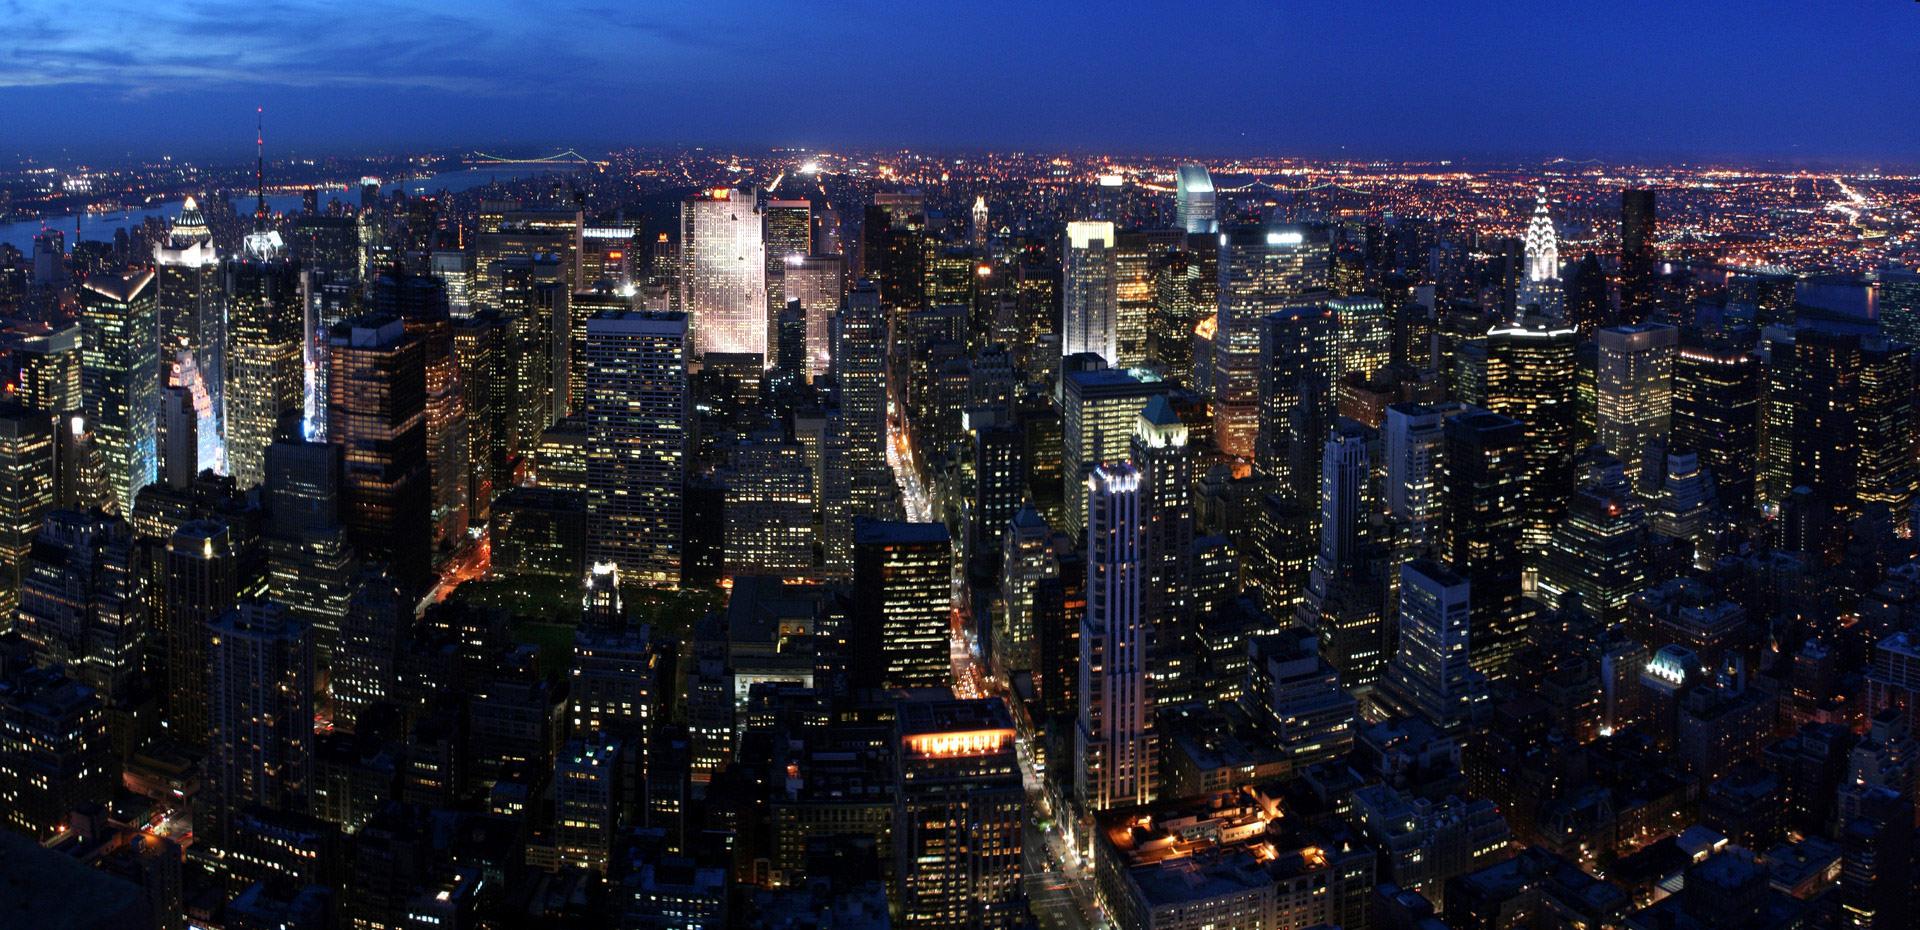 Панорамное фото нью йорка